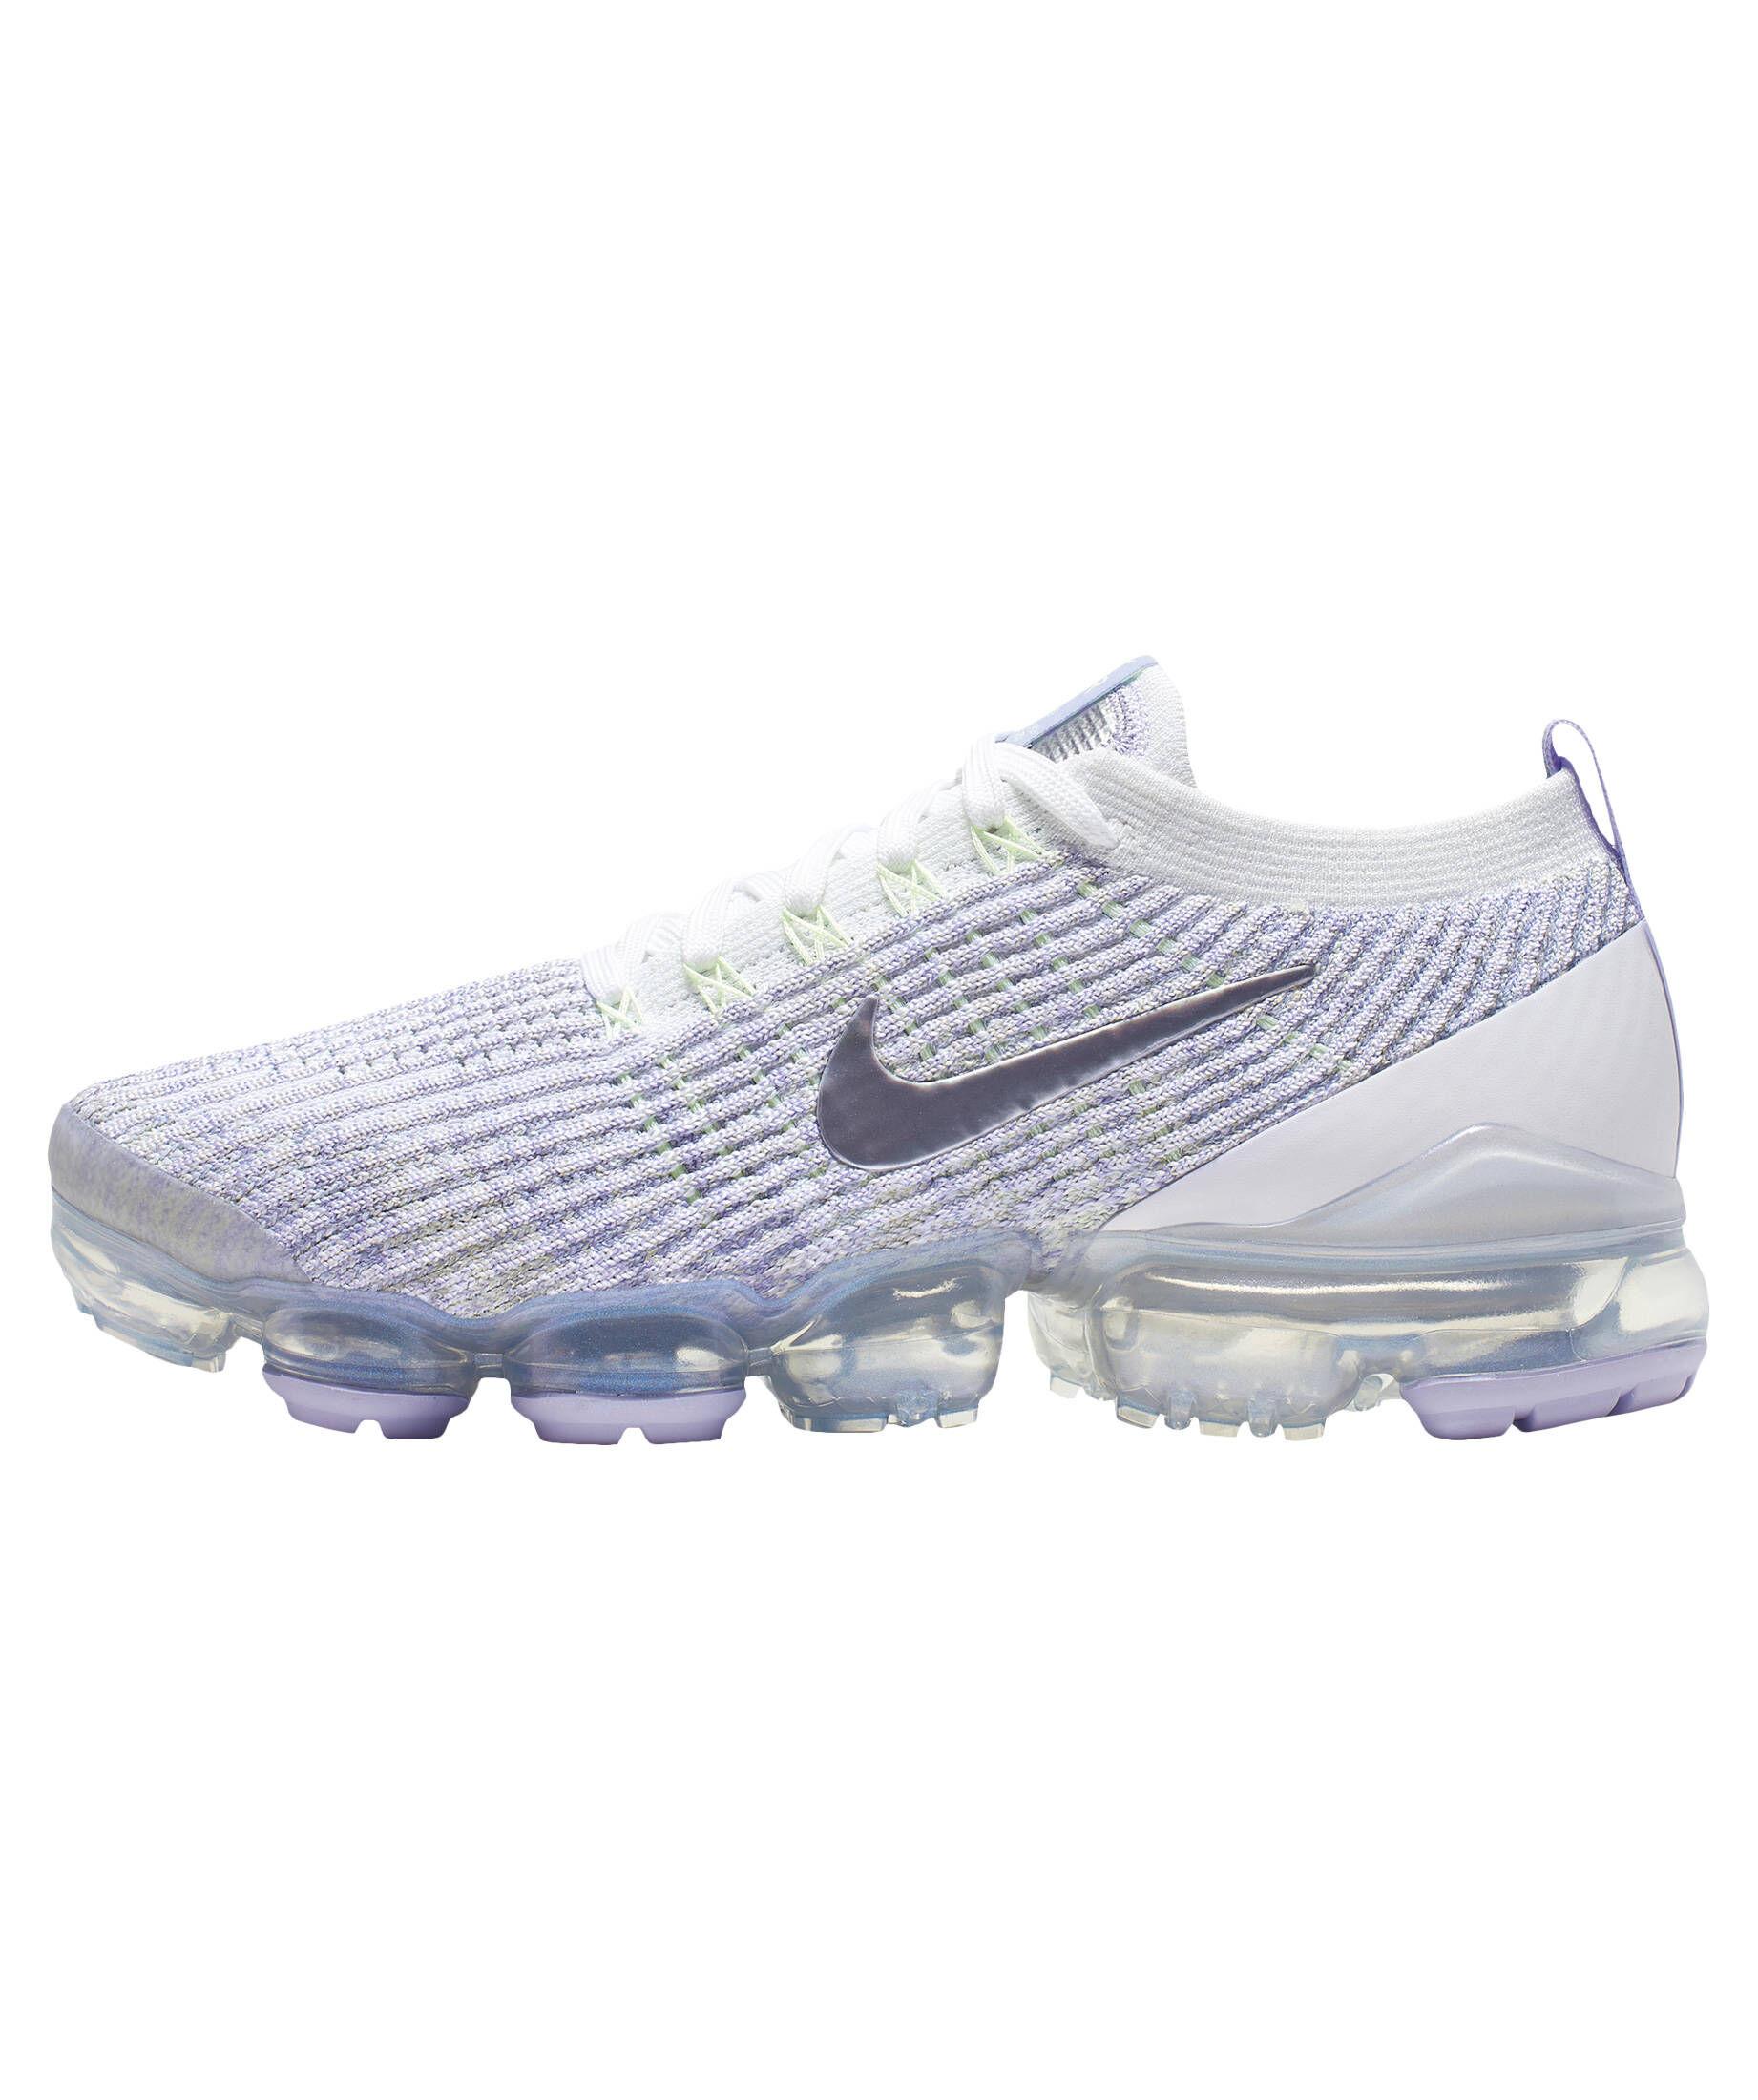 Verfeinerung Nike Schuhe Damen Bone Grau Nike Running Air